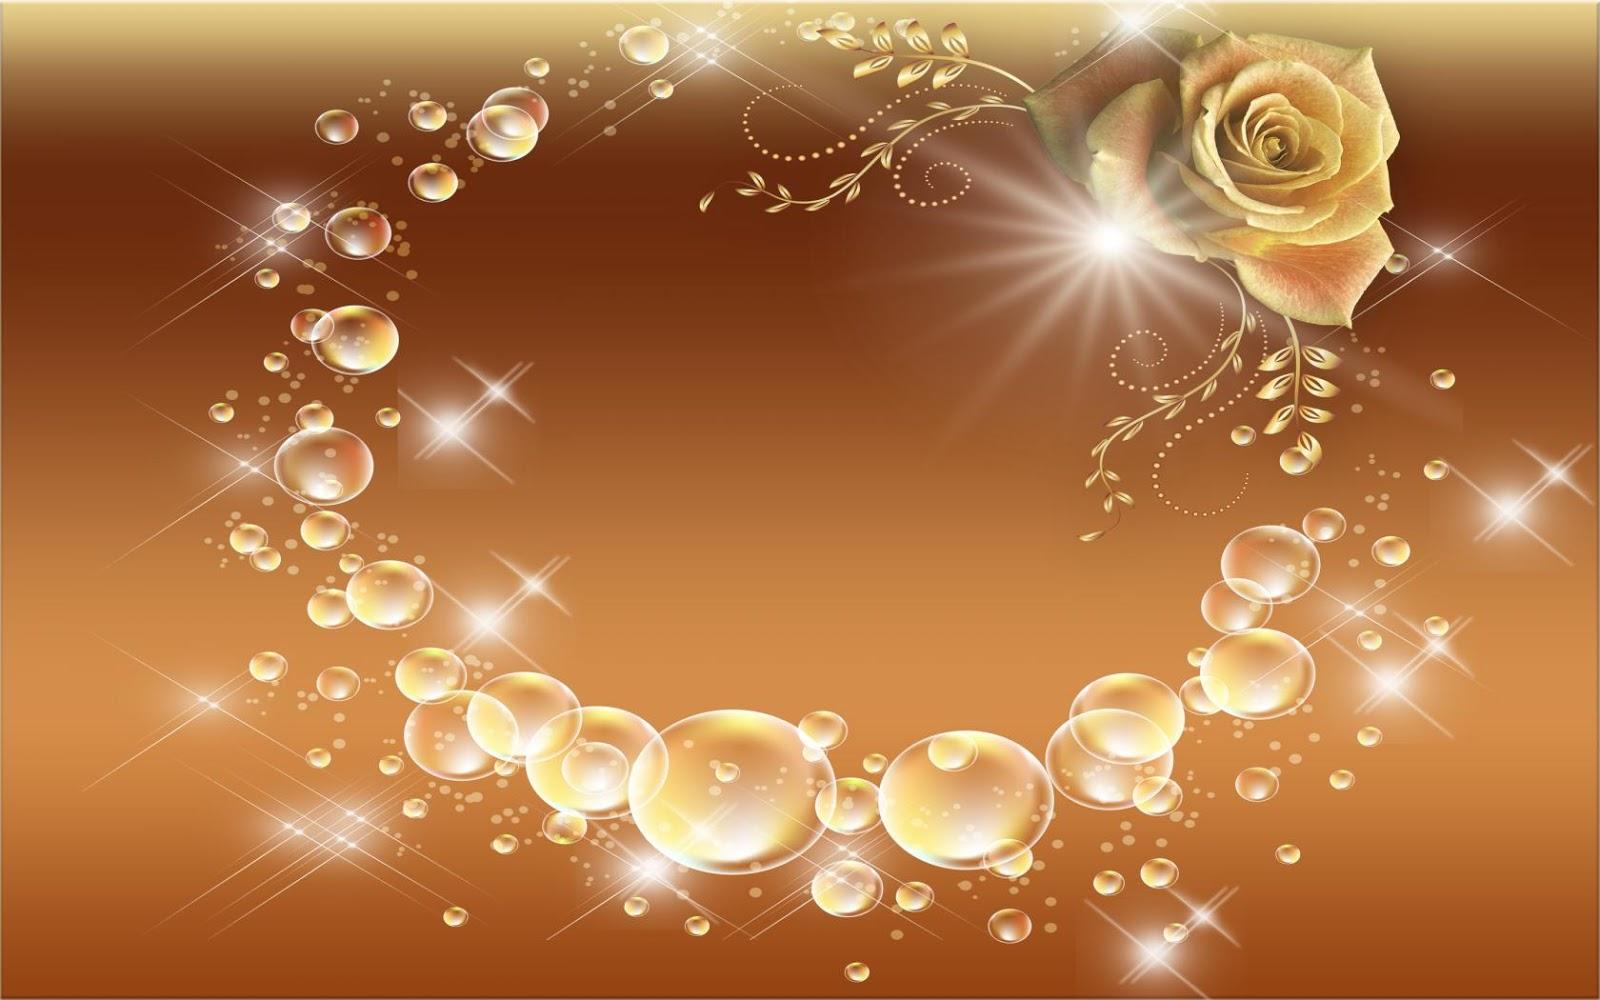 http://2.bp.blogspot.com/-tWKxw6WDBMA/UPrLq0nMfSI/AAAAAAAACIY/LQ_JTxBYA8s/s1600/Wallpapers%20HD%20Lite.jpg